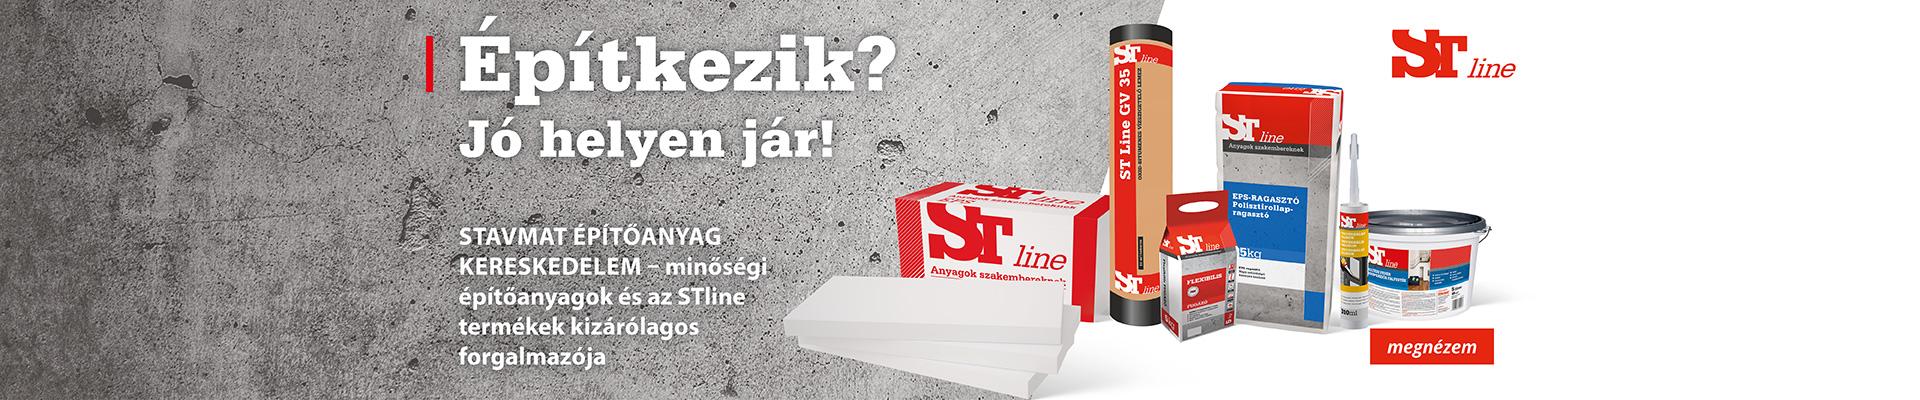 ST line